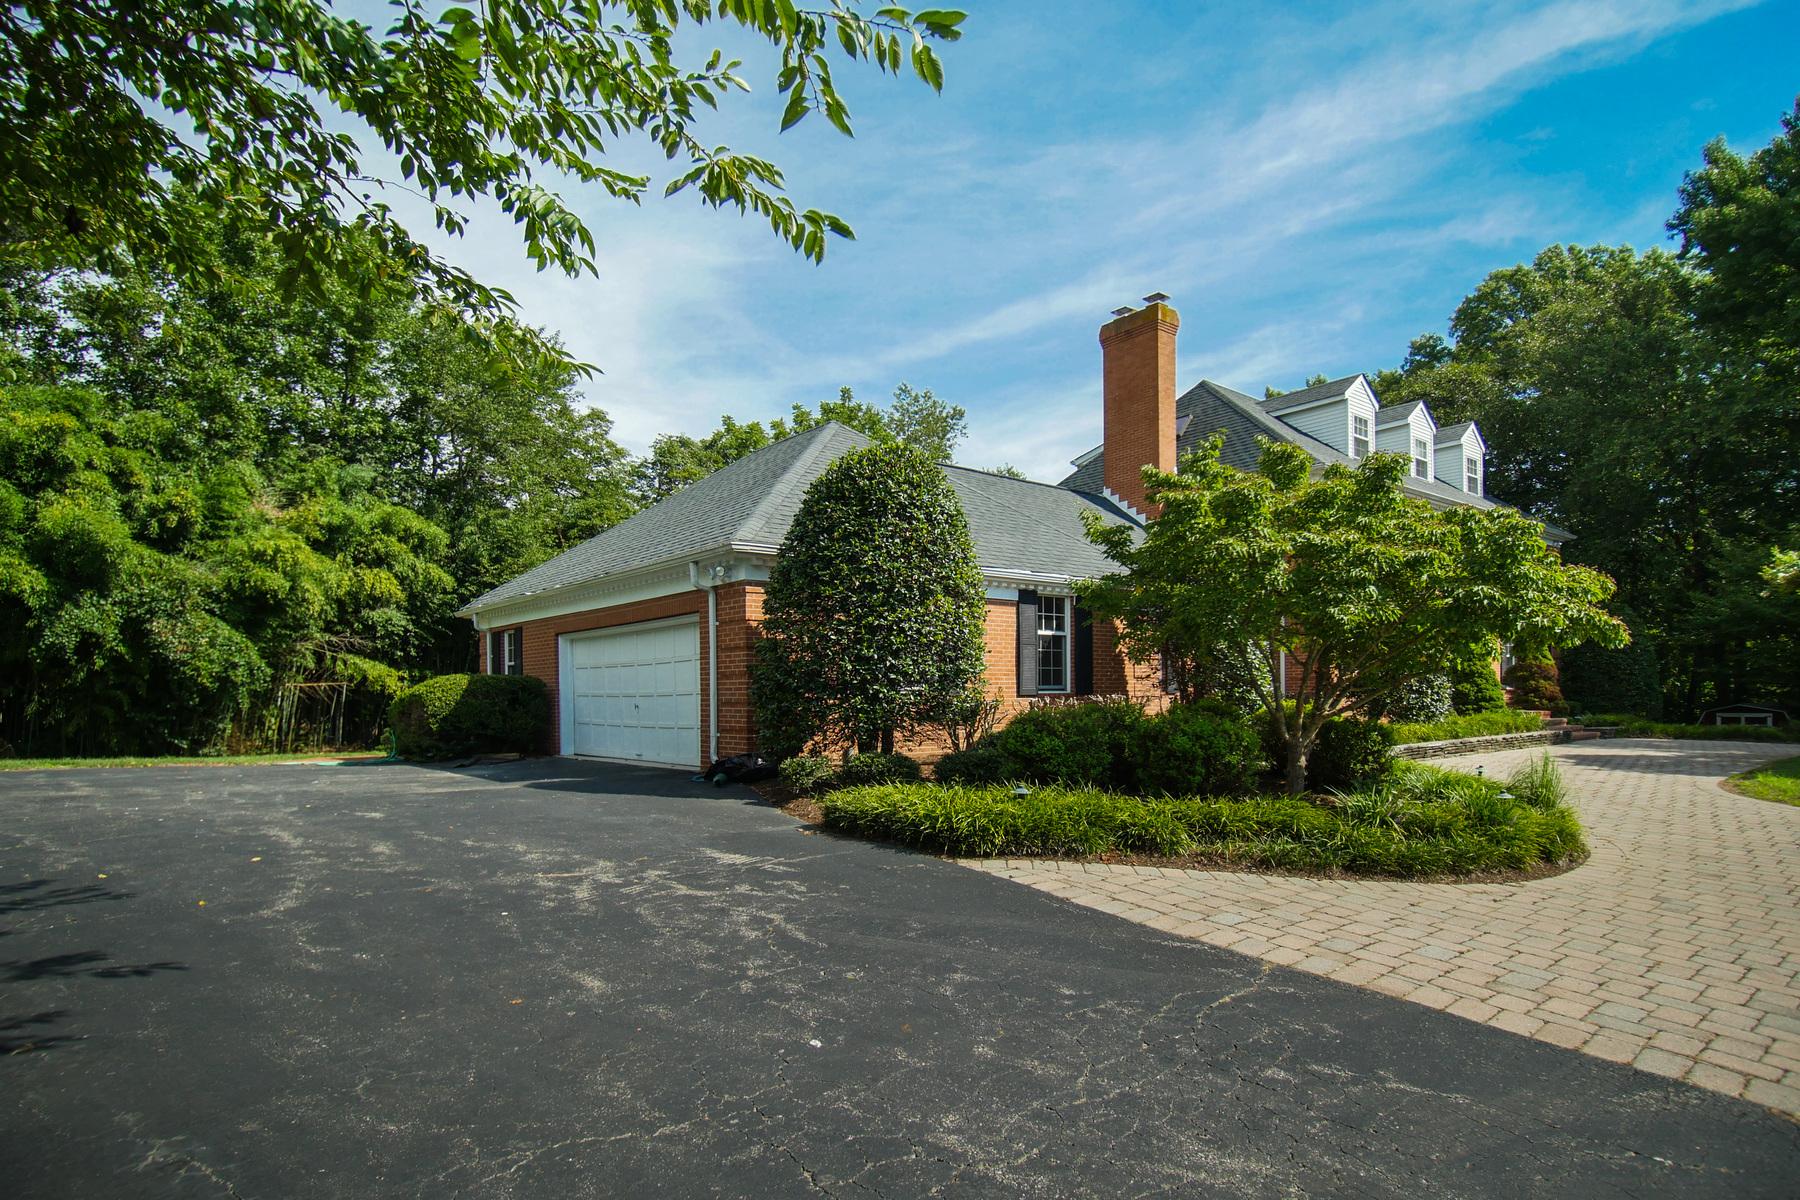 Additional photo for property listing at 576 Stocketts Run Road, Davidsonville 576 Stocketts Run Rd Davidsonville, メリーランド 21035 アメリカ合衆国